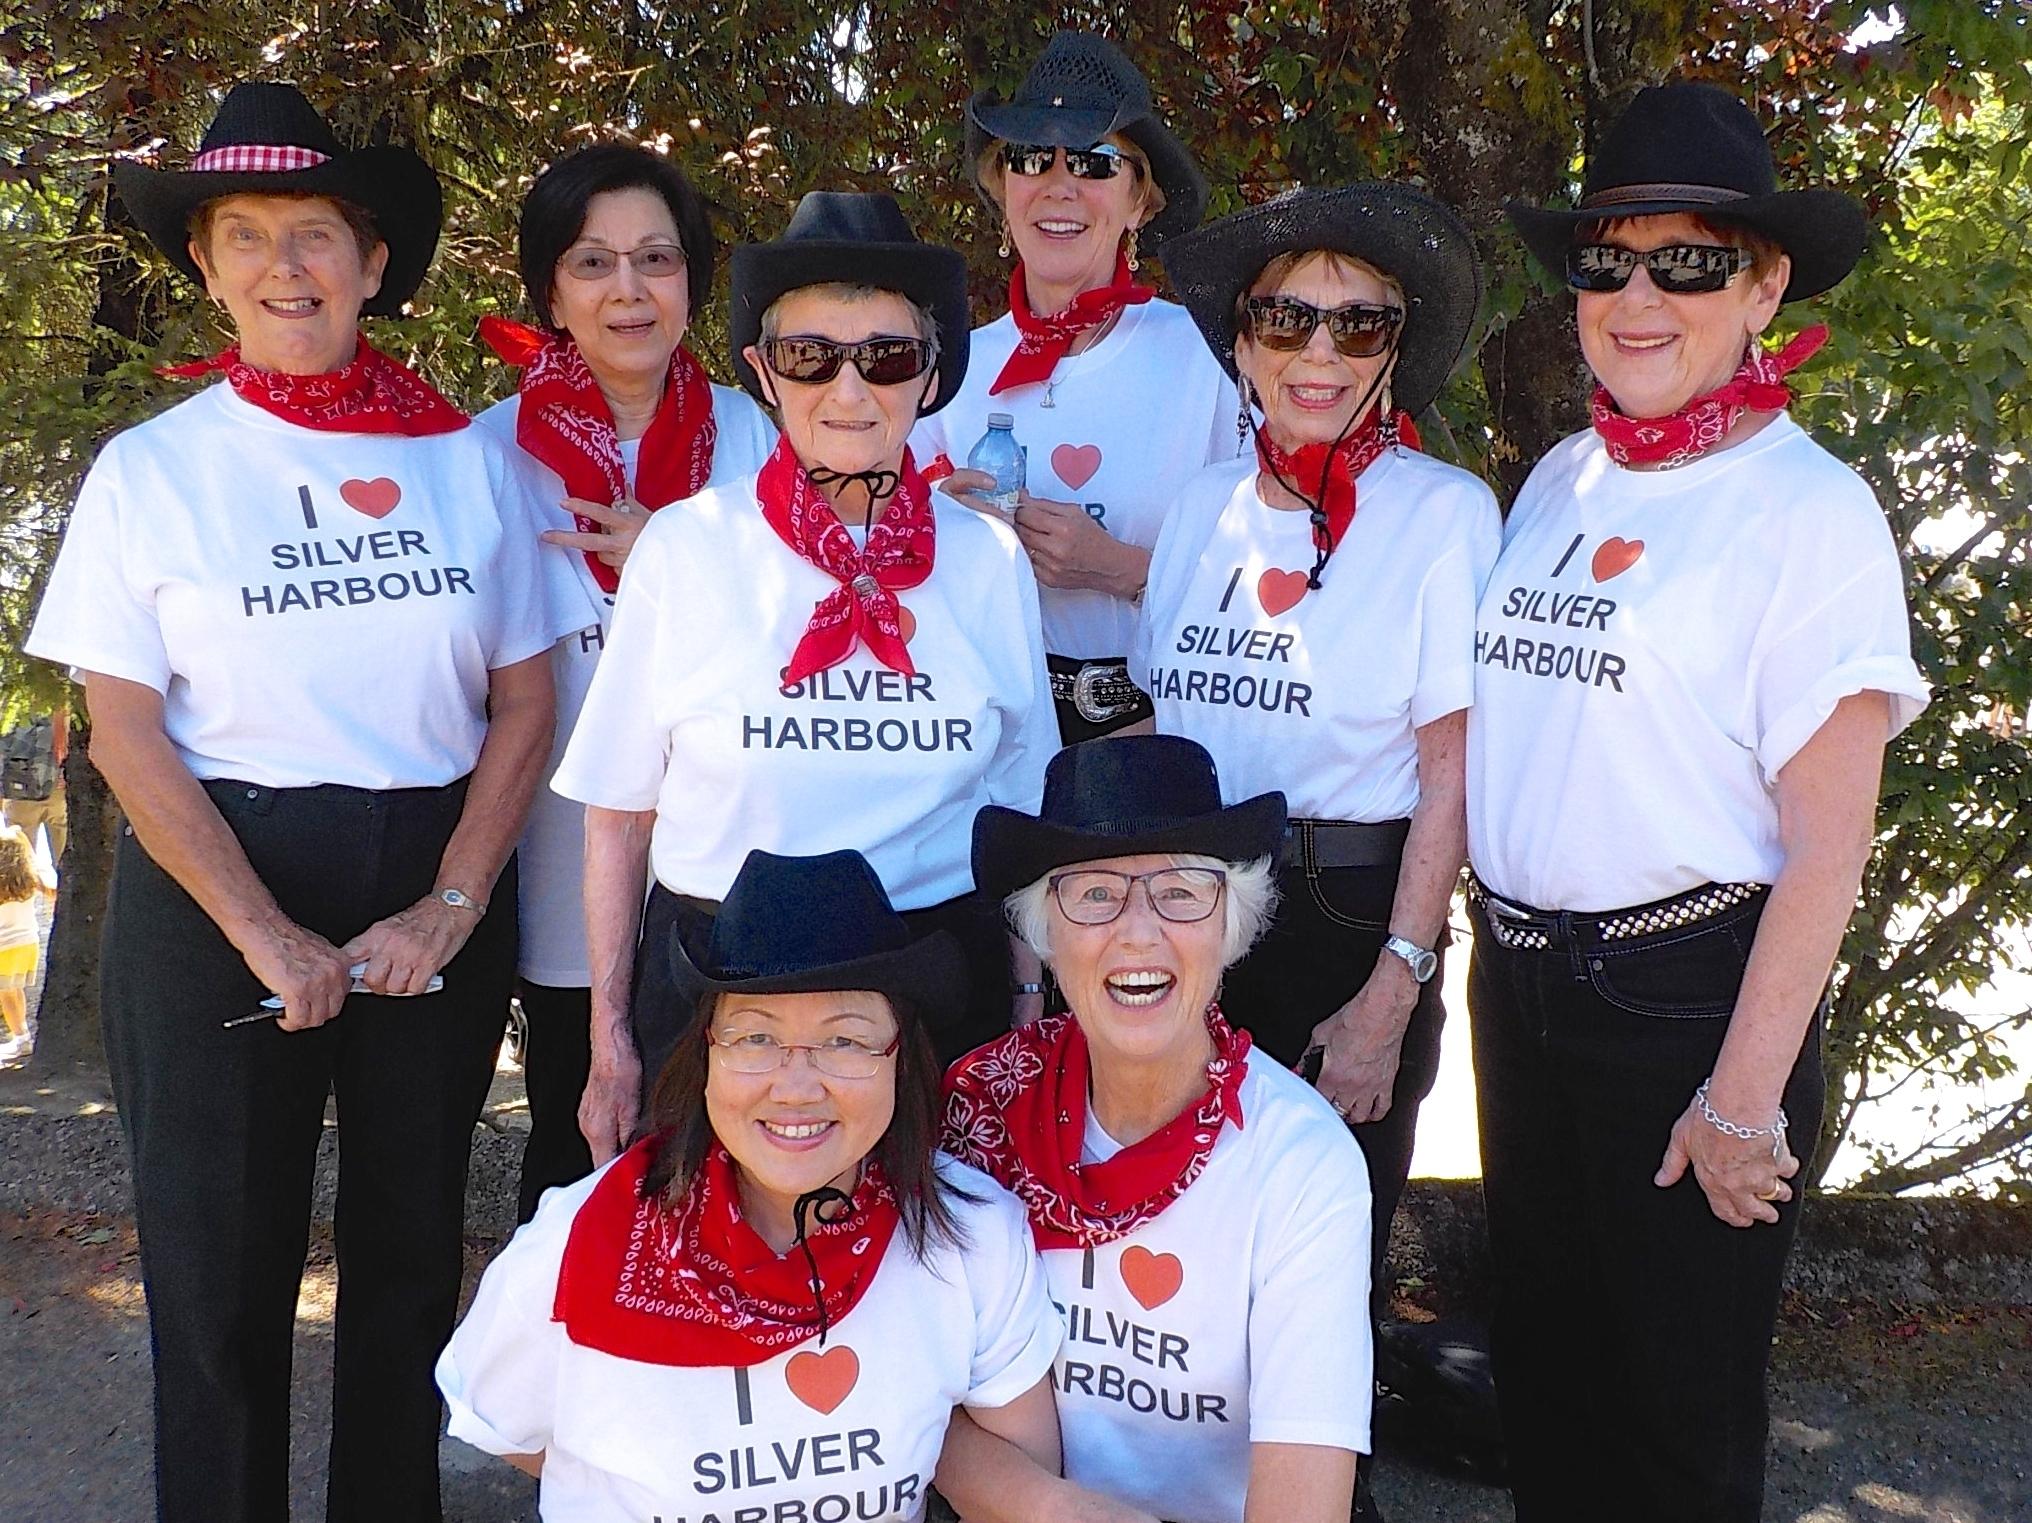 Silver Harbour Seniors' Activity Centre Society